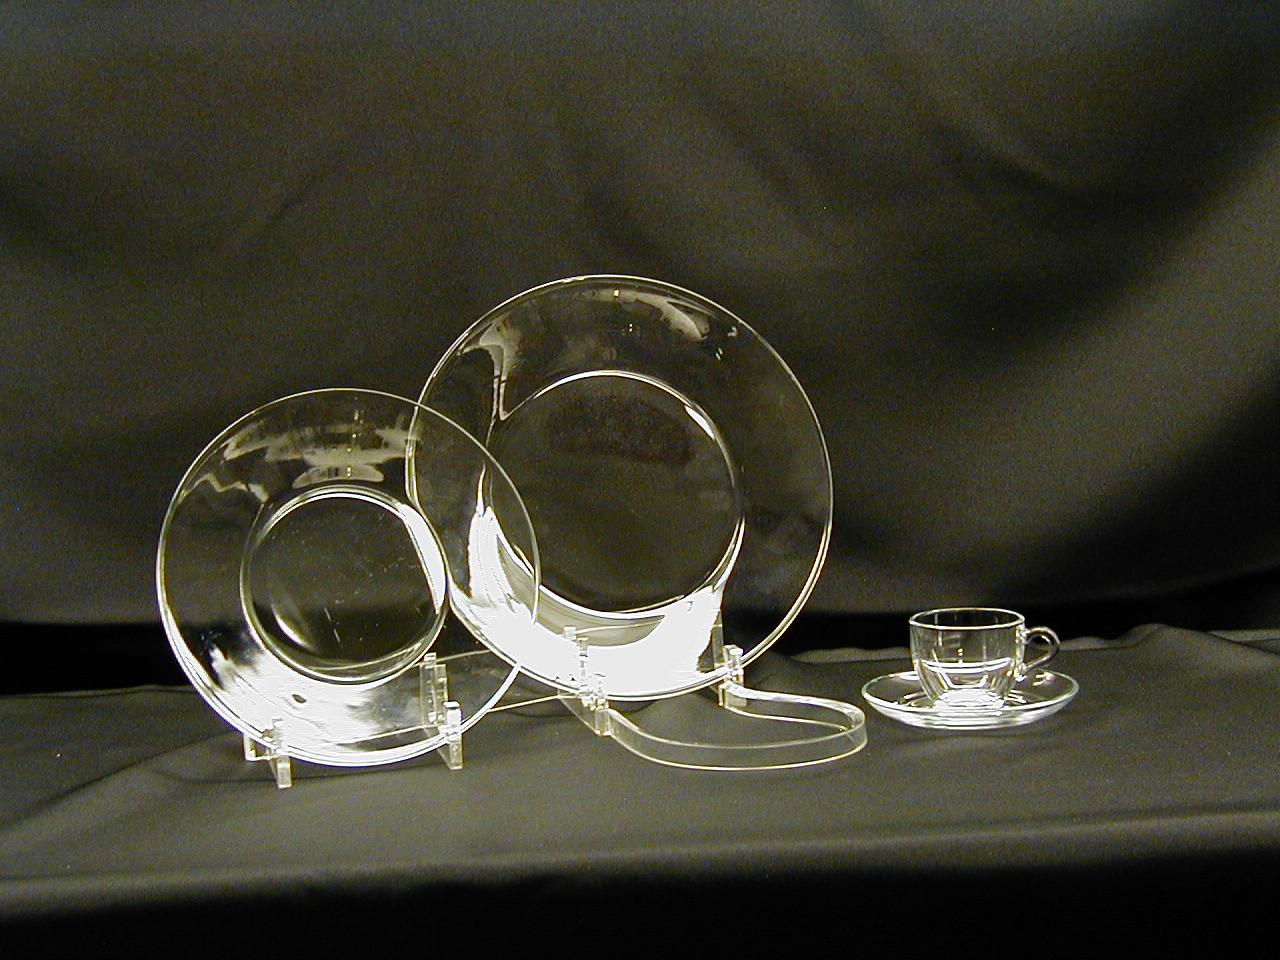 Glass Dinner Plates  Glass Dinnerware Rental Glass Dinner Plates & Bowls